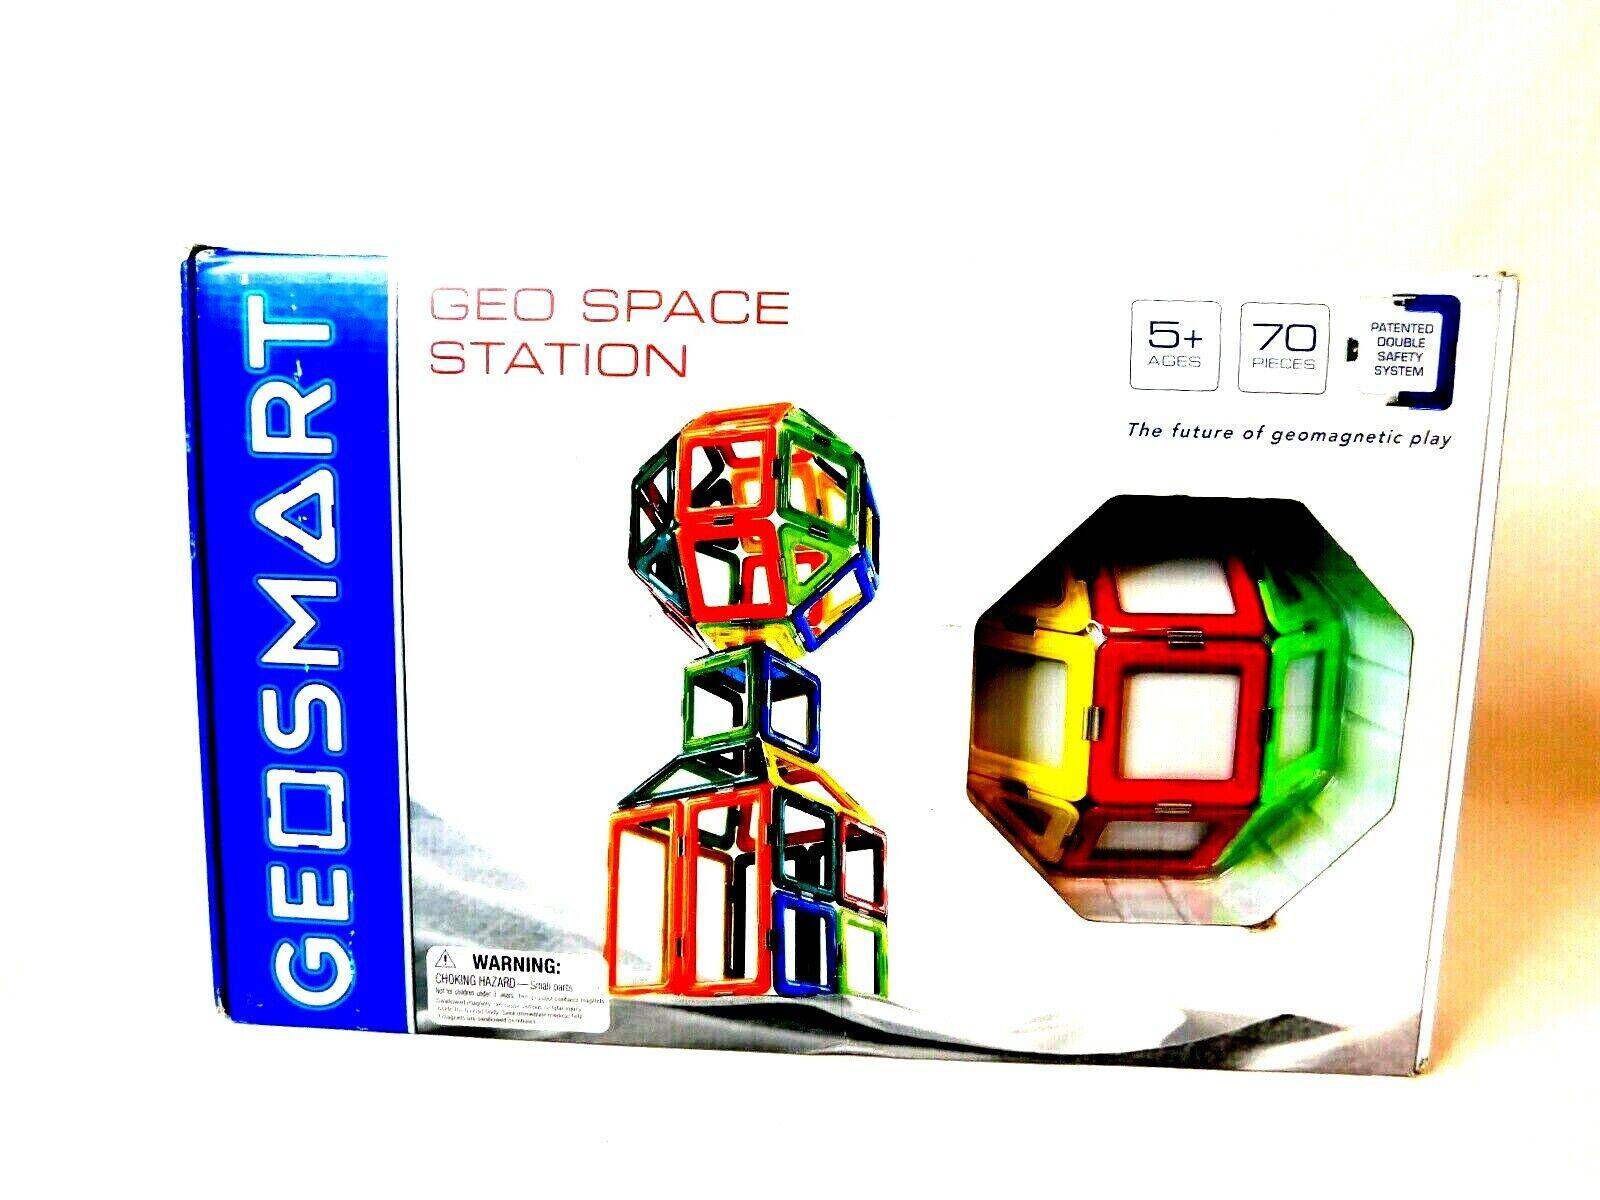 Geosmart Geo Space Station 70 piece Geometric Shape Building Set New